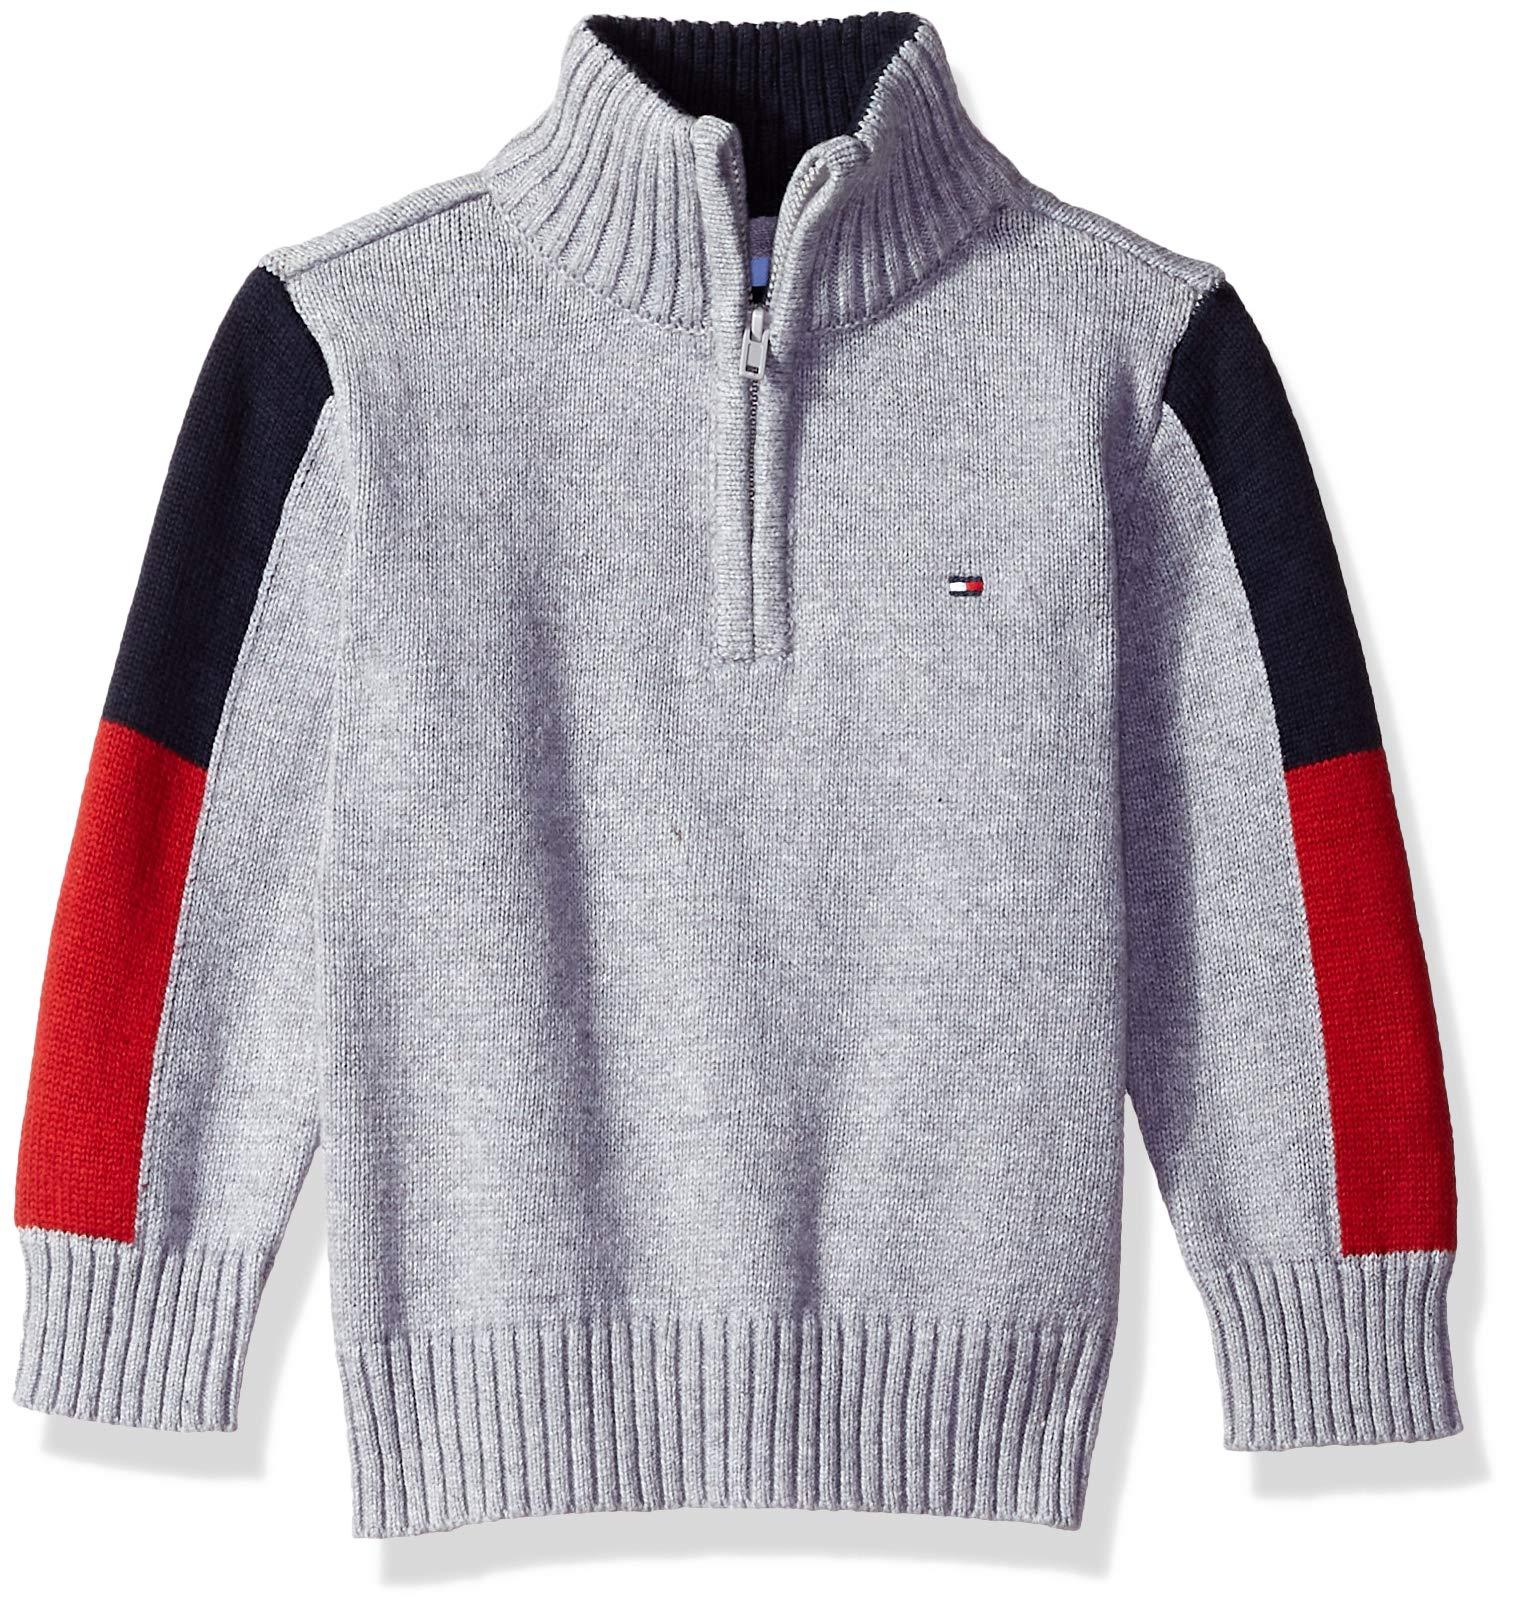 Tommy Hilfiger Toddler Boys' Long Sleeve Half Zip Pullover Sweater, Eddie Grey Heather 3T